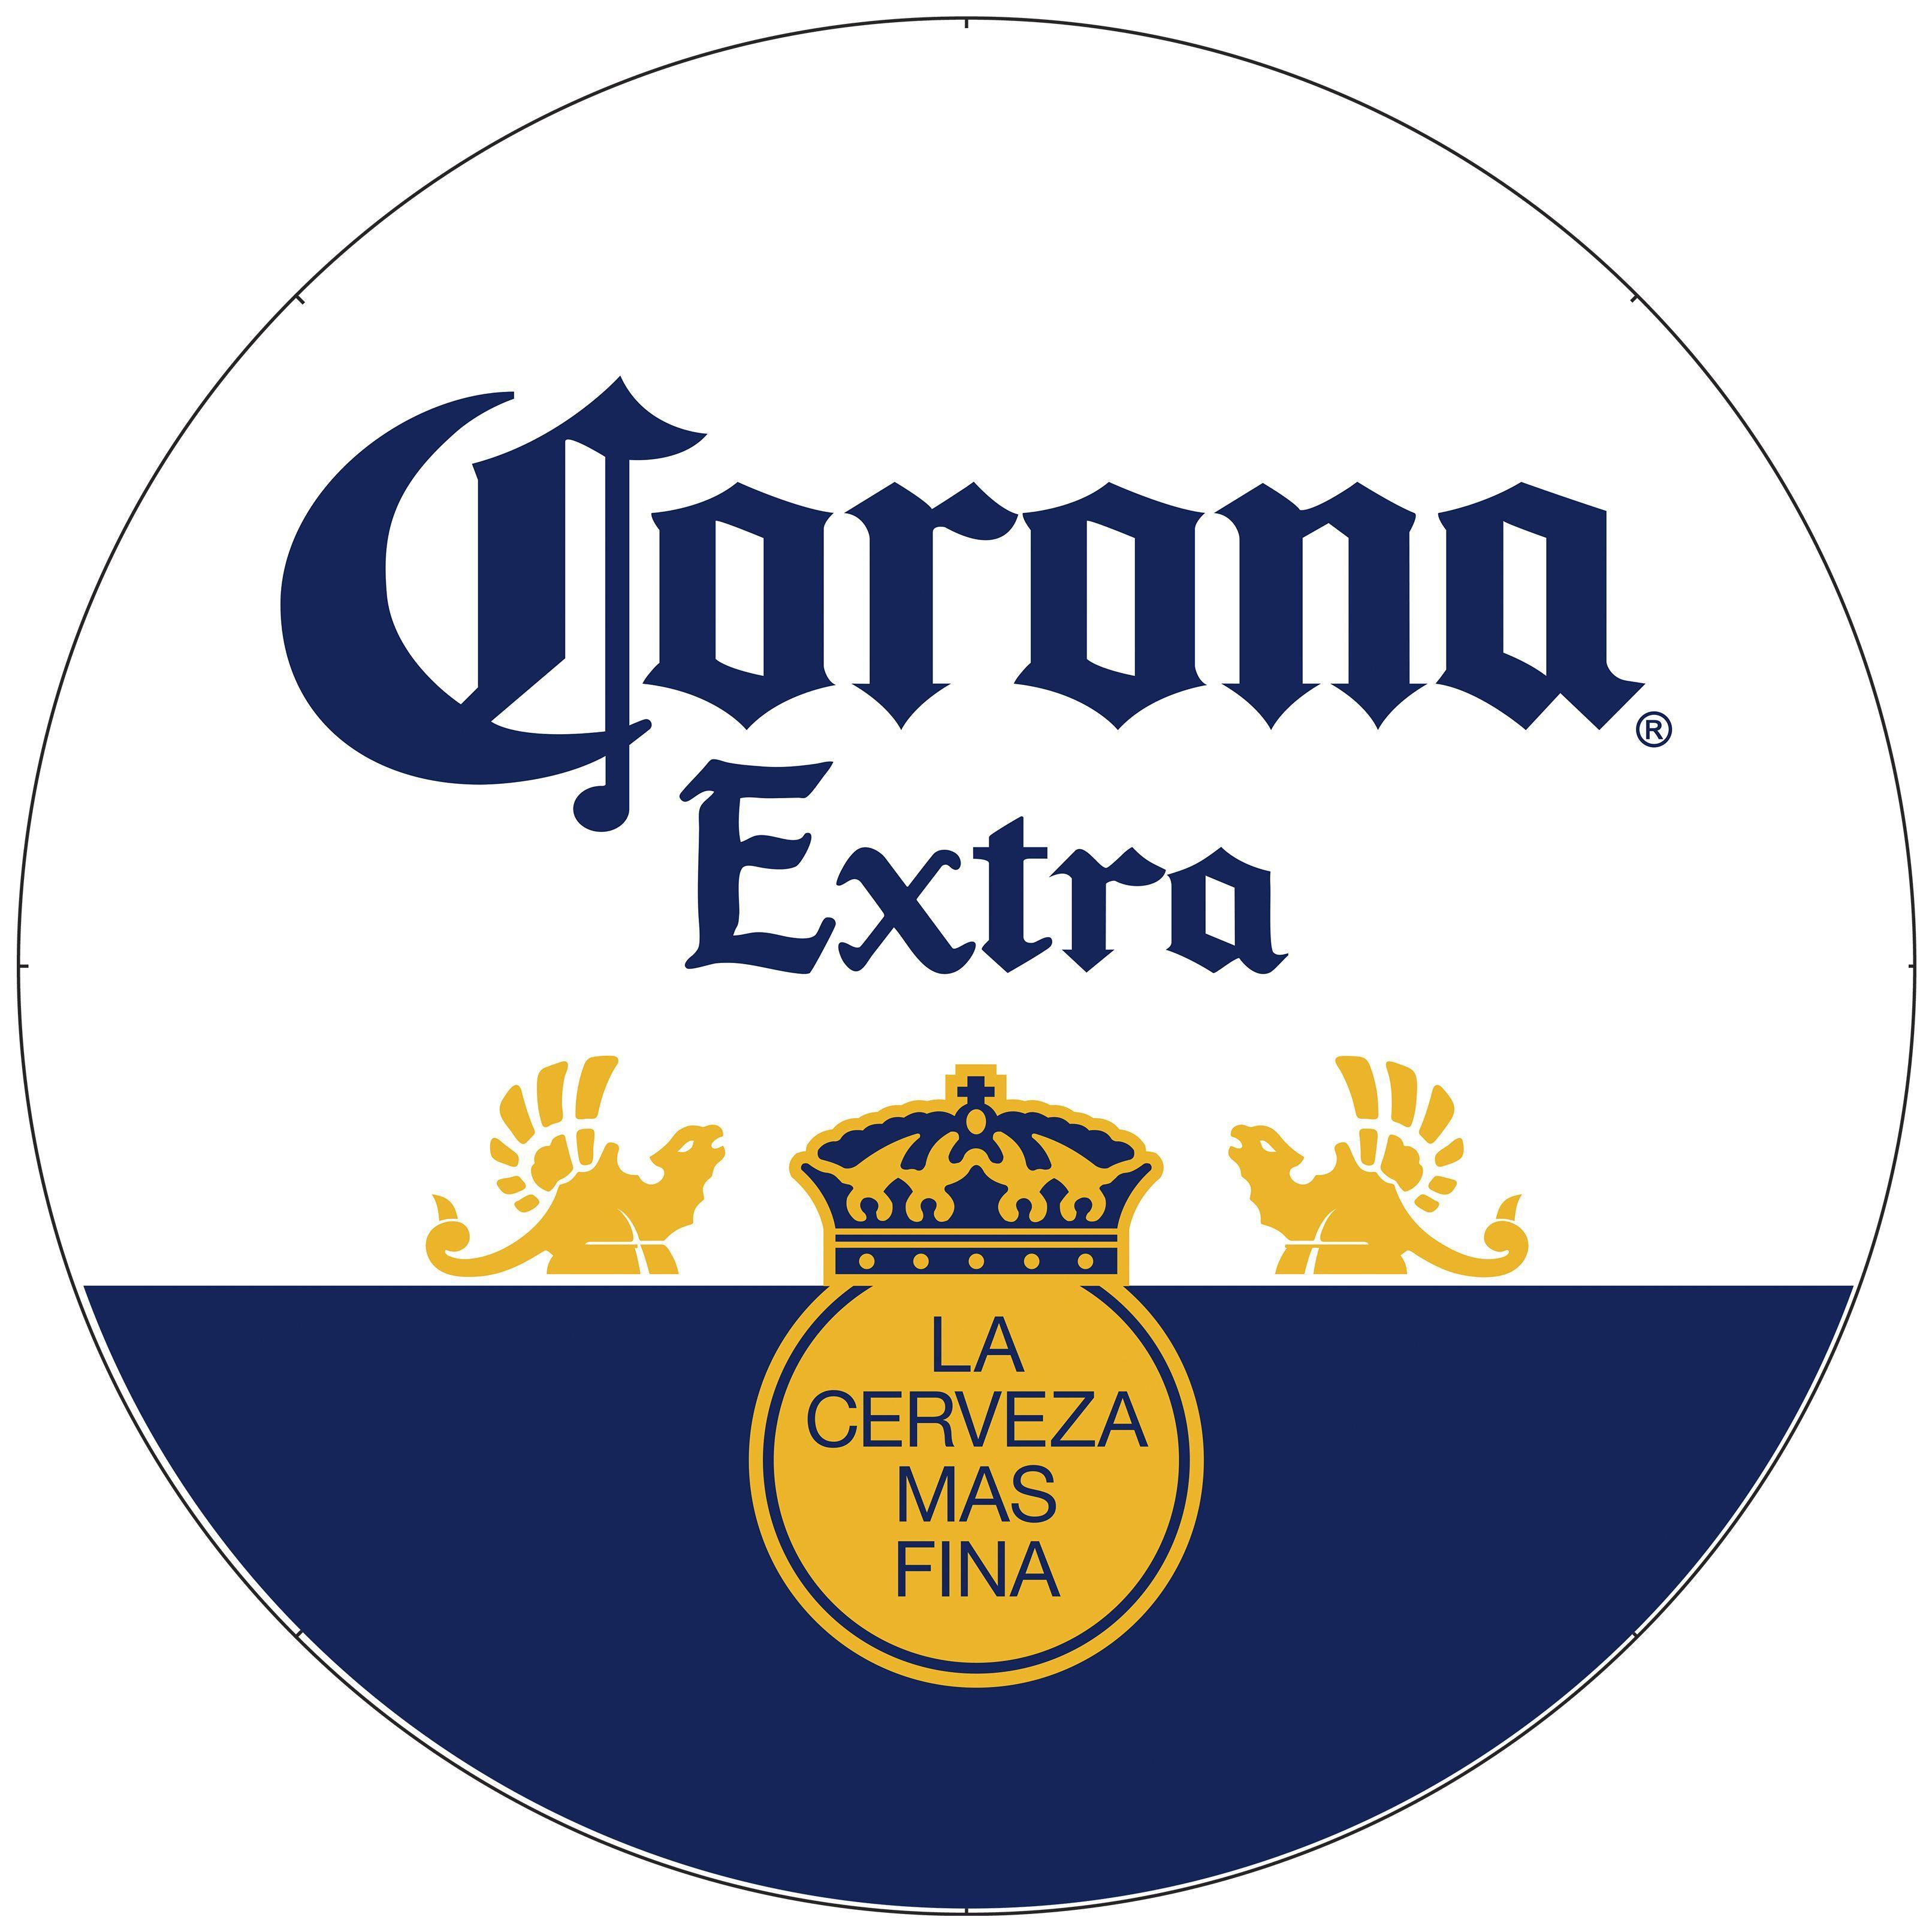 what is the corona symbol